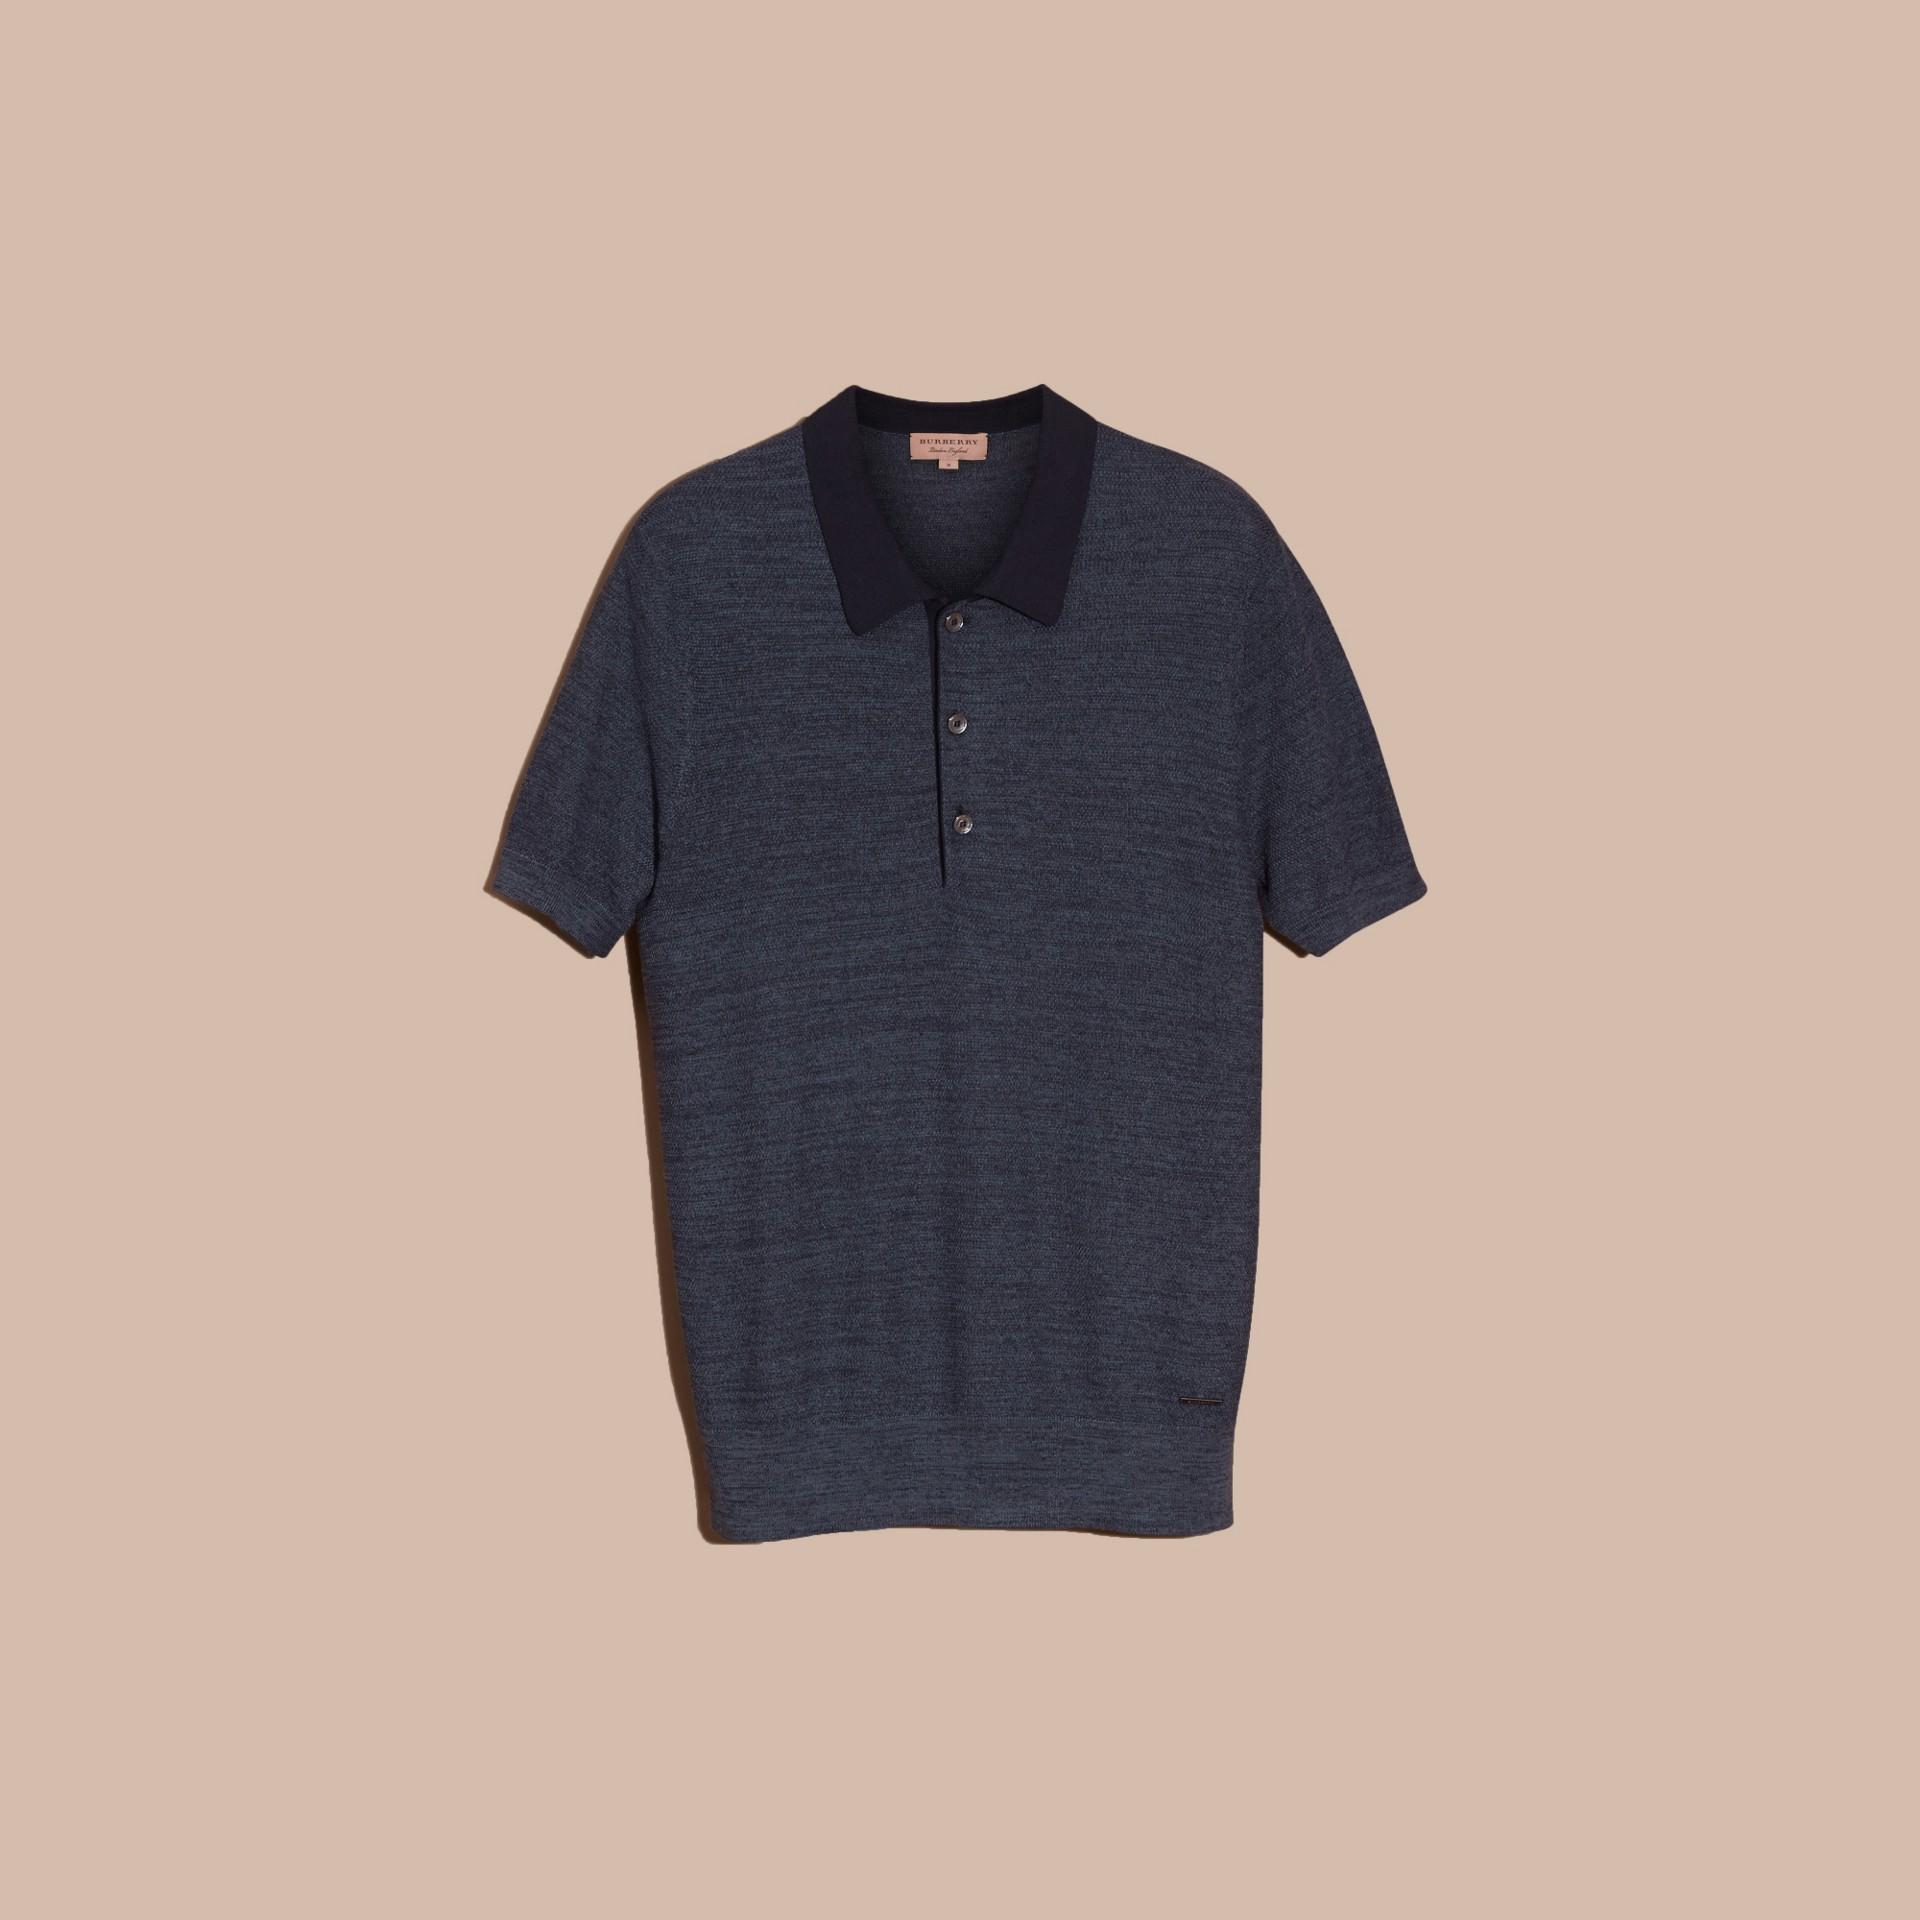 Bright steel blue Camisa polo de seda leve - galeria de imagens 3